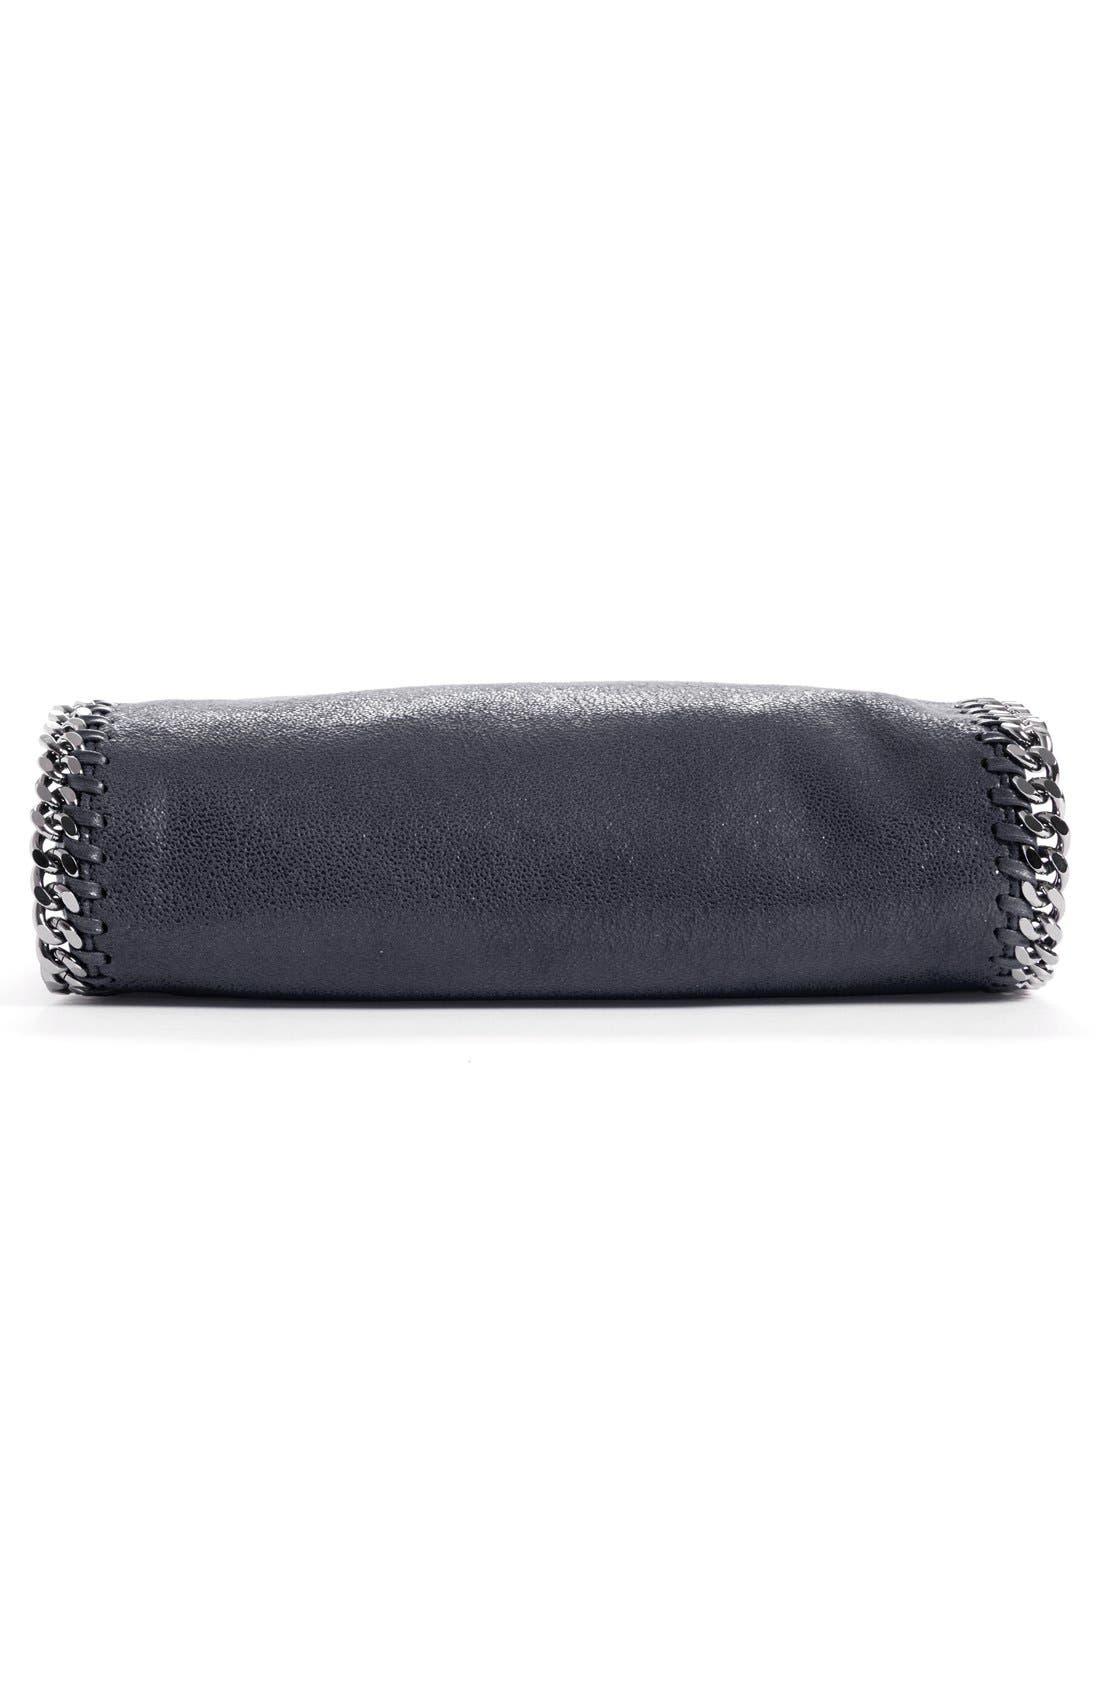 'Mini Falabella - Shaggy Deer' Faux Leather Tote,                             Alternate thumbnail 3, color,                             BLACK W/ SILVER